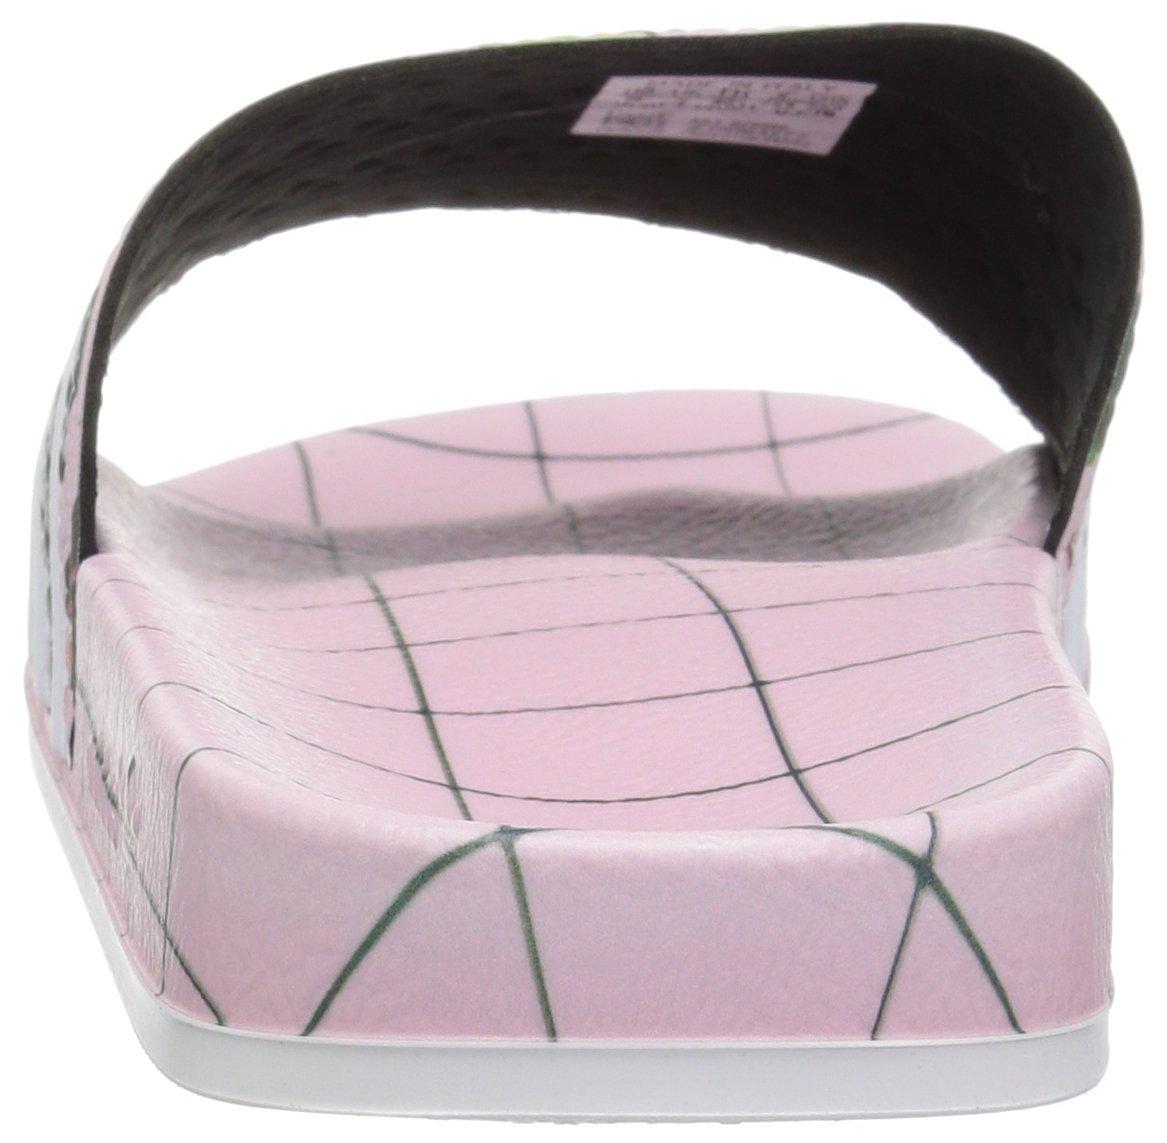 adidas Originals Women's Adilette Slide Sandals B077X9KBXF 9 B(M) US|White/Wonder Pink